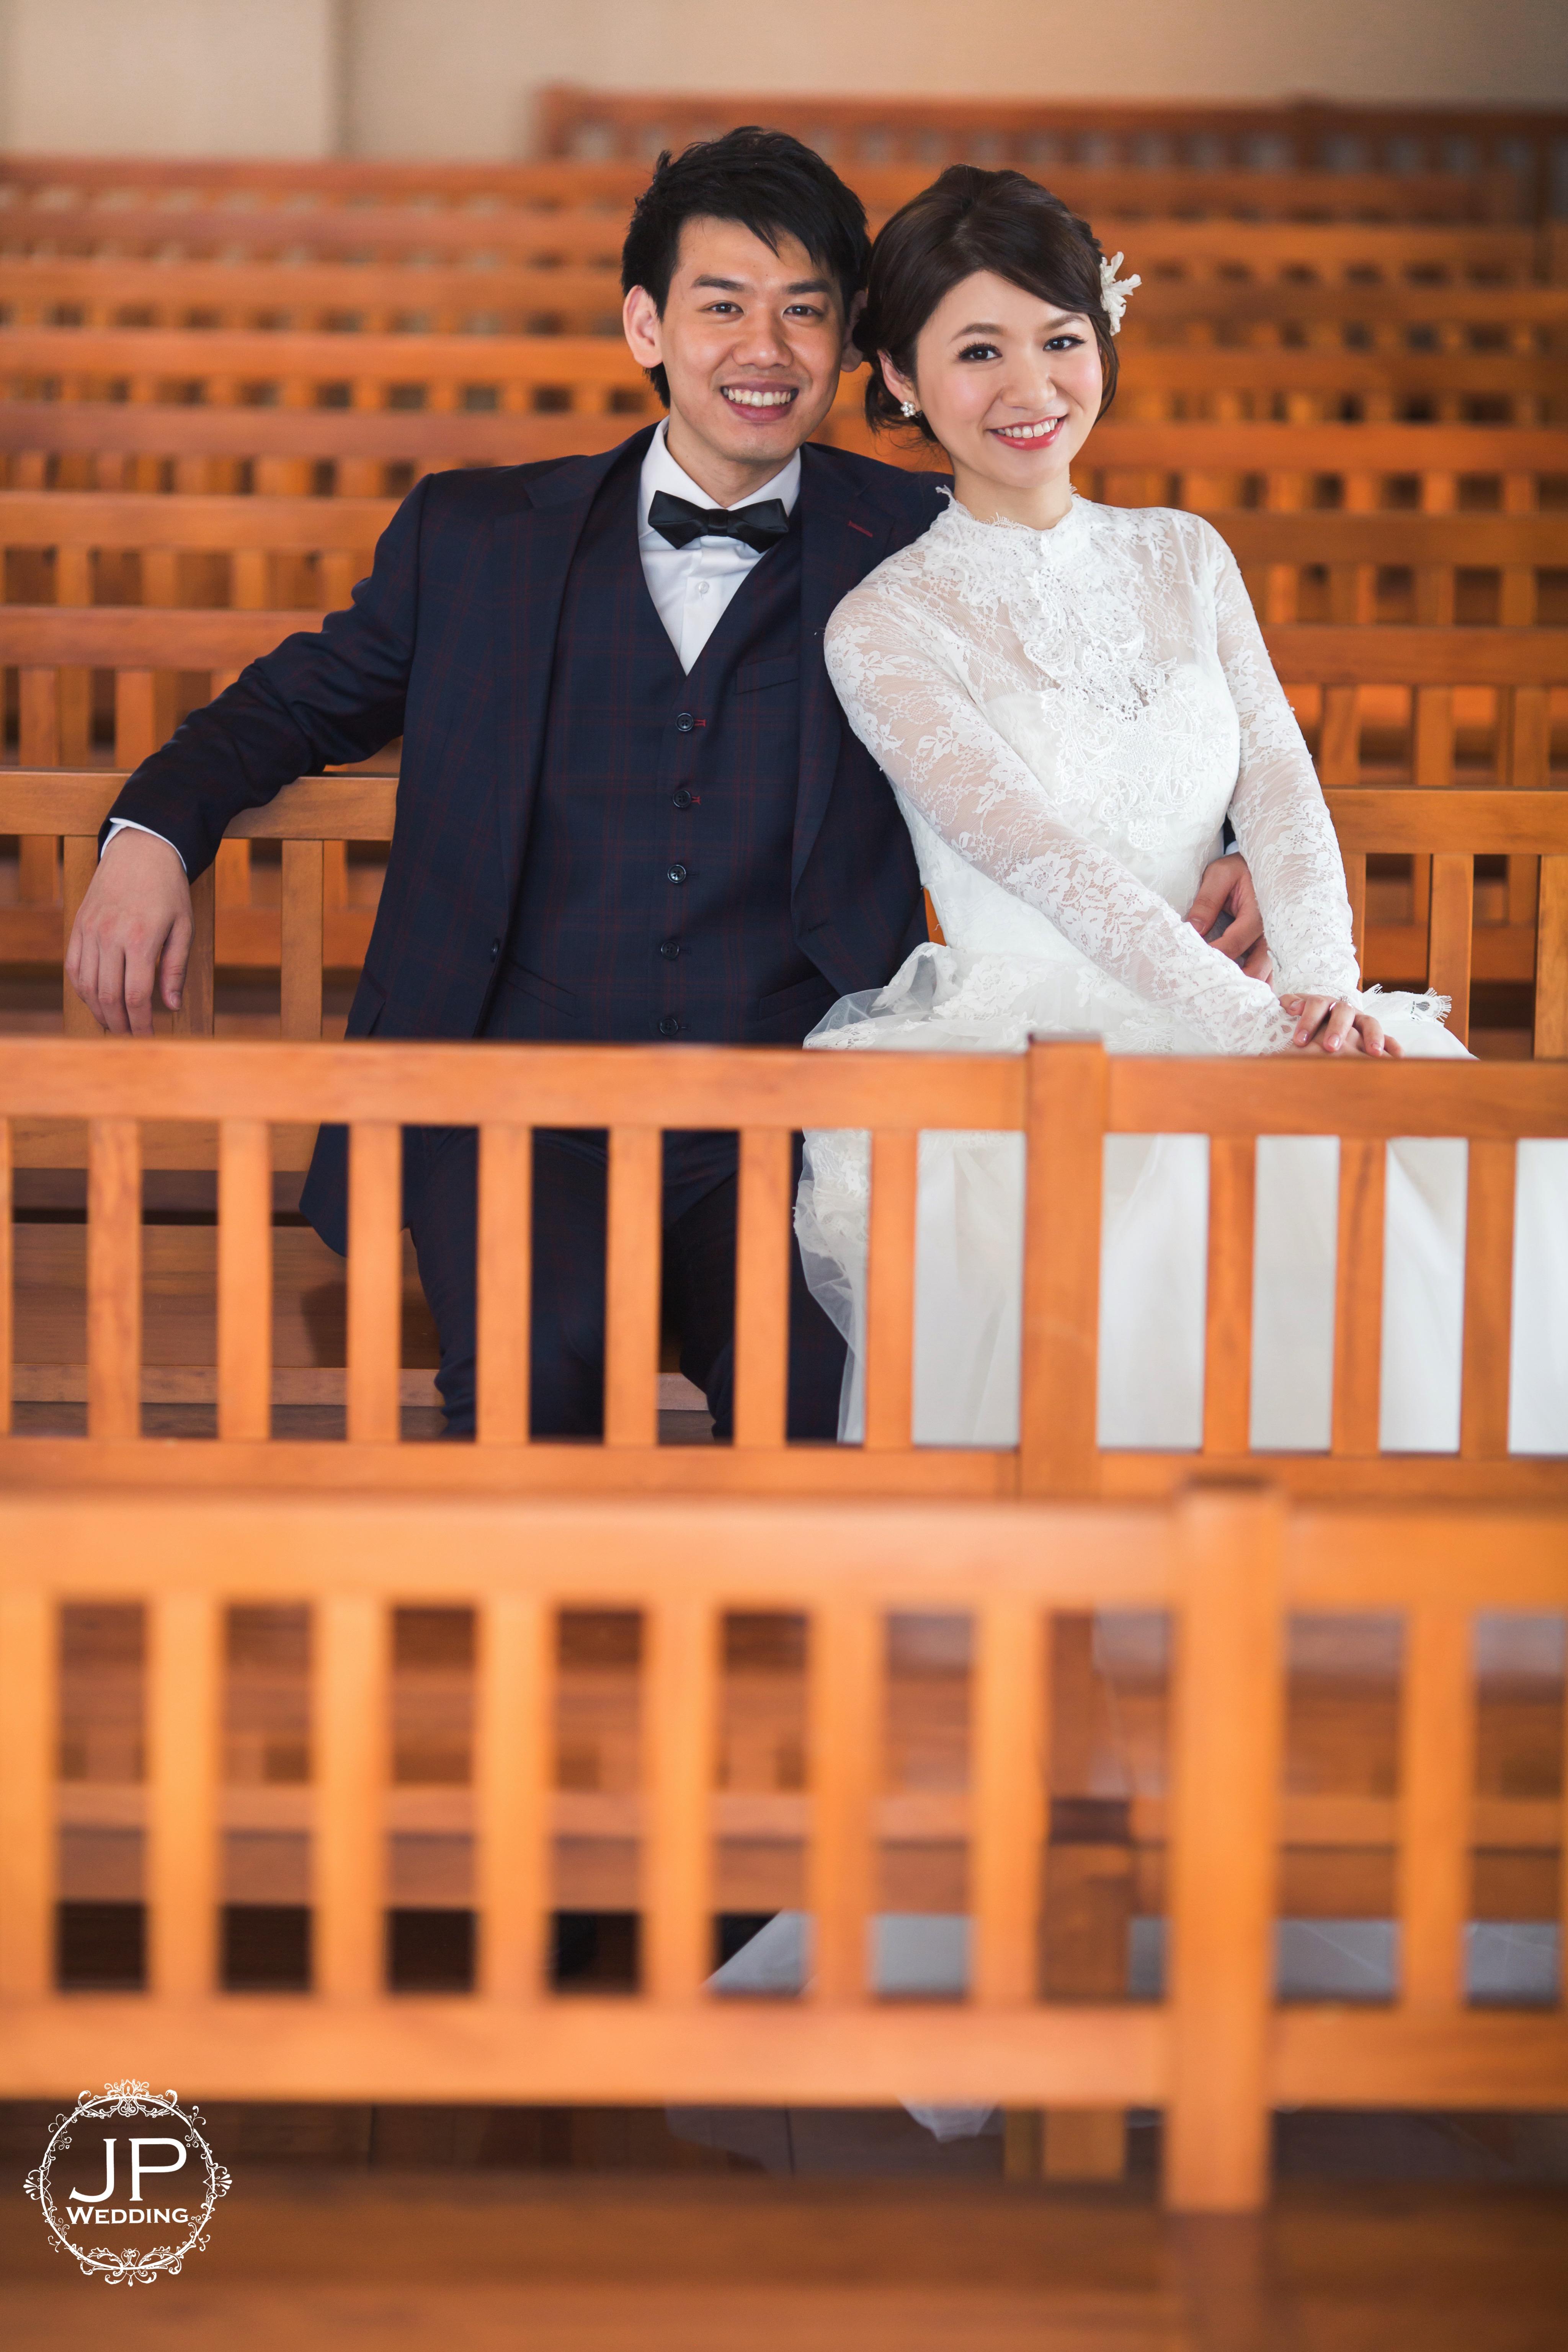 Japan Chapel Prewedding Photoshoot- JP Wedding-7